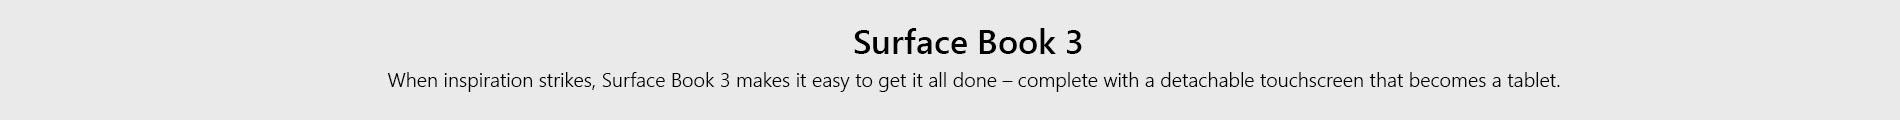 Microsoft Surface Store Revamp Book3 Ms Lp